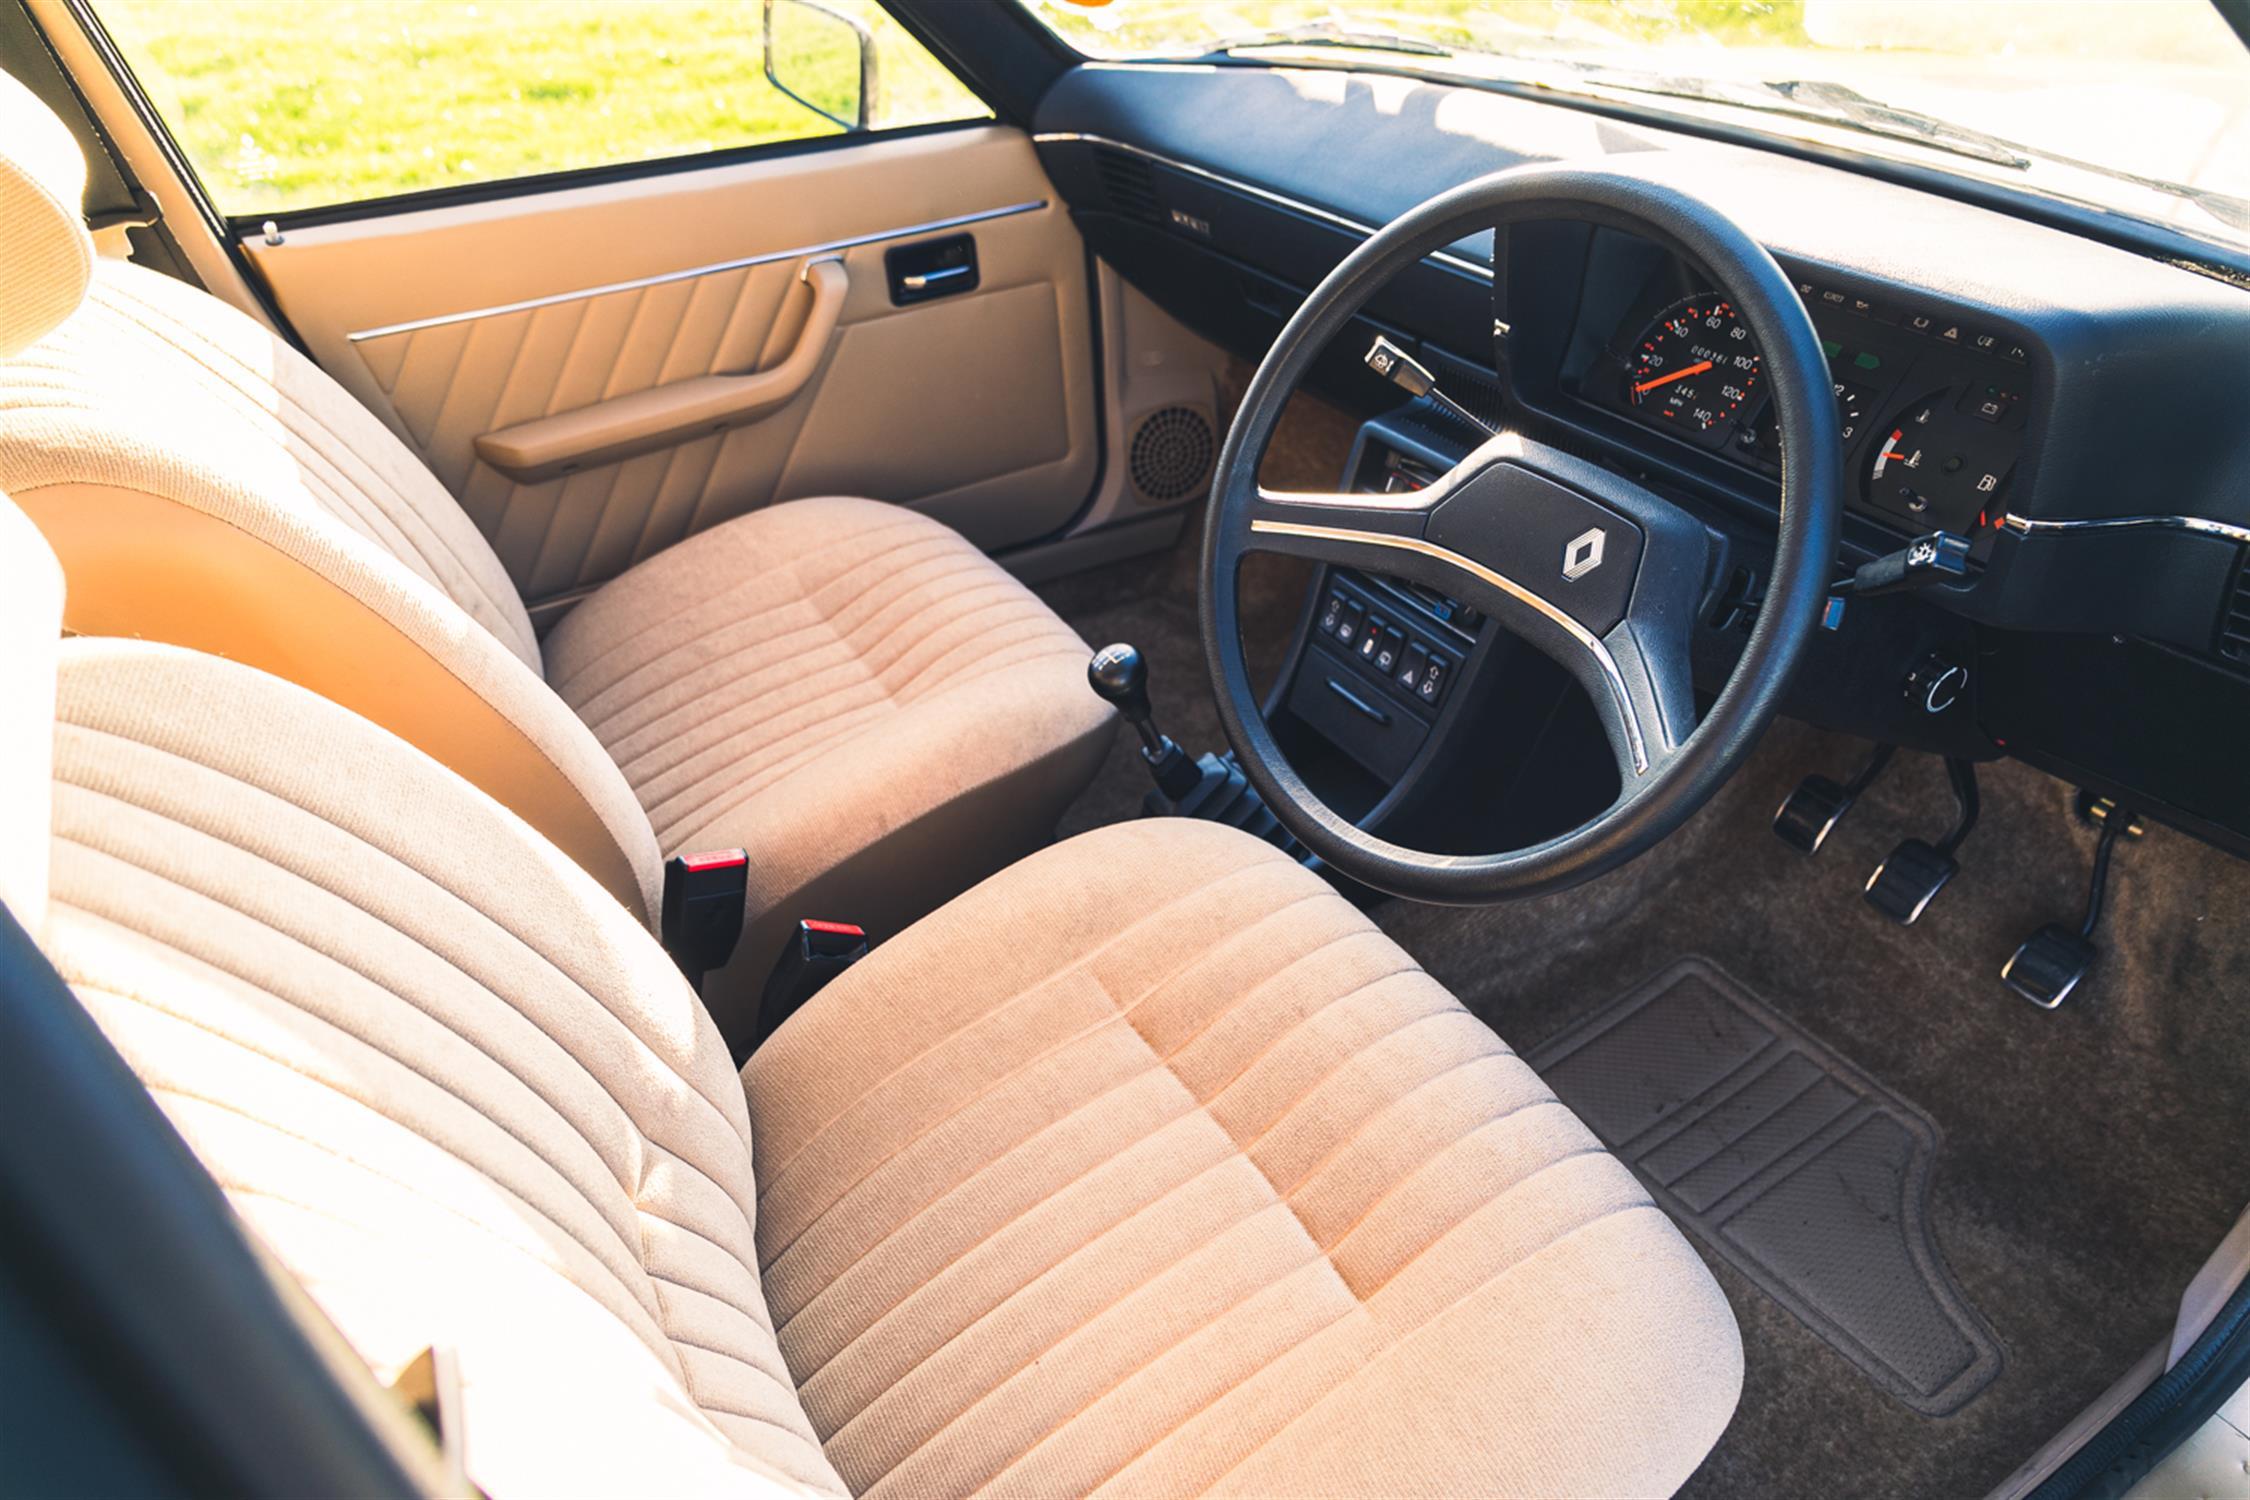 1983 Renault 18 GTL Estate - Image 7 of 32